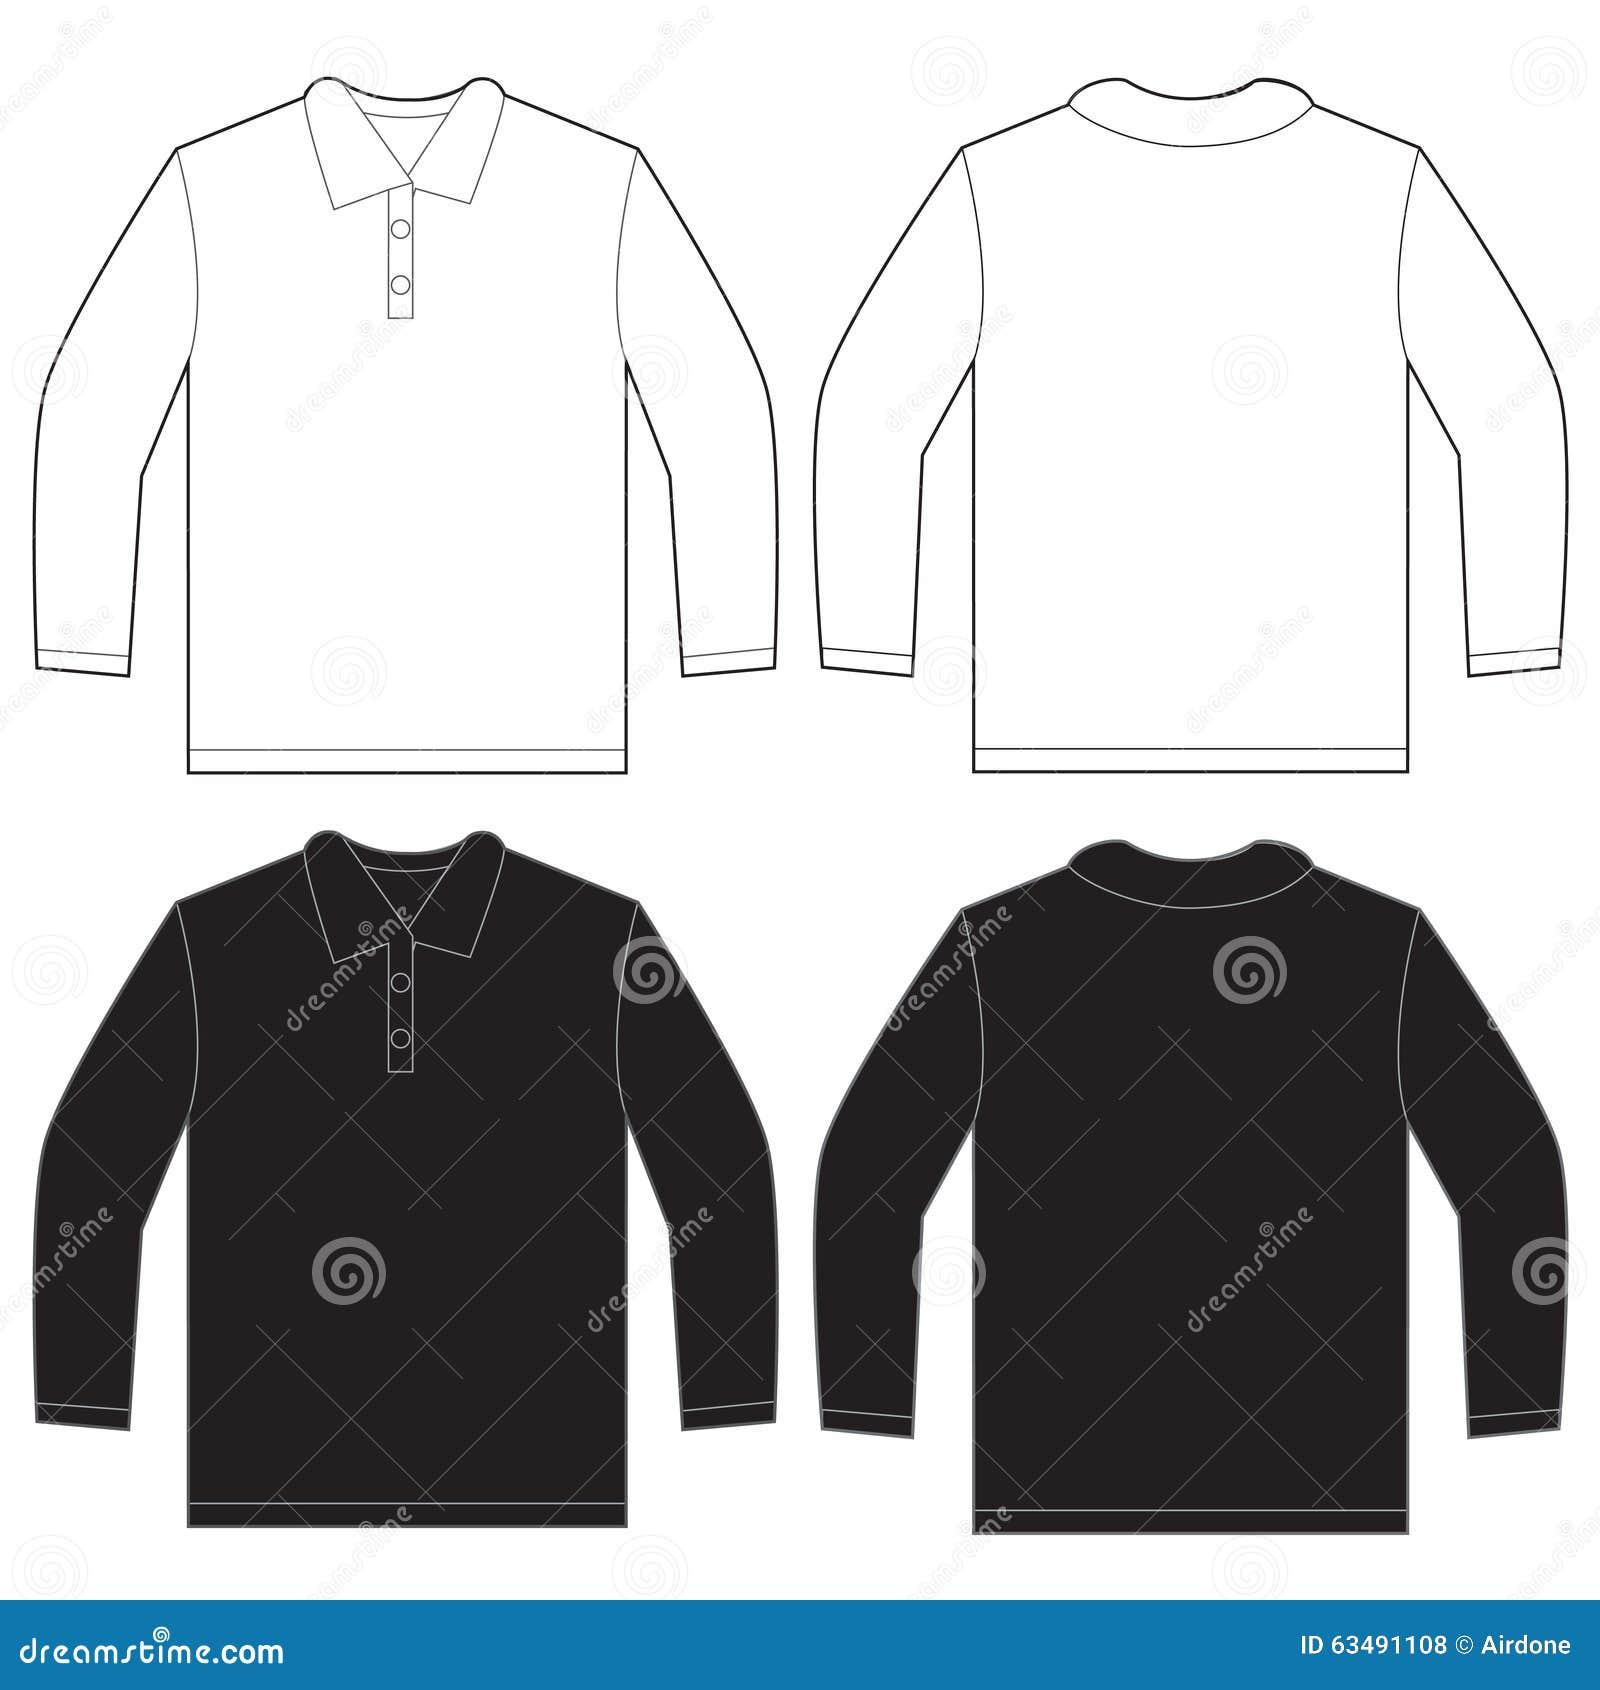 Shirt design on sleeve - Black White Long Sleeve Polo Shirt Design Template Royalty Free Stock Photos